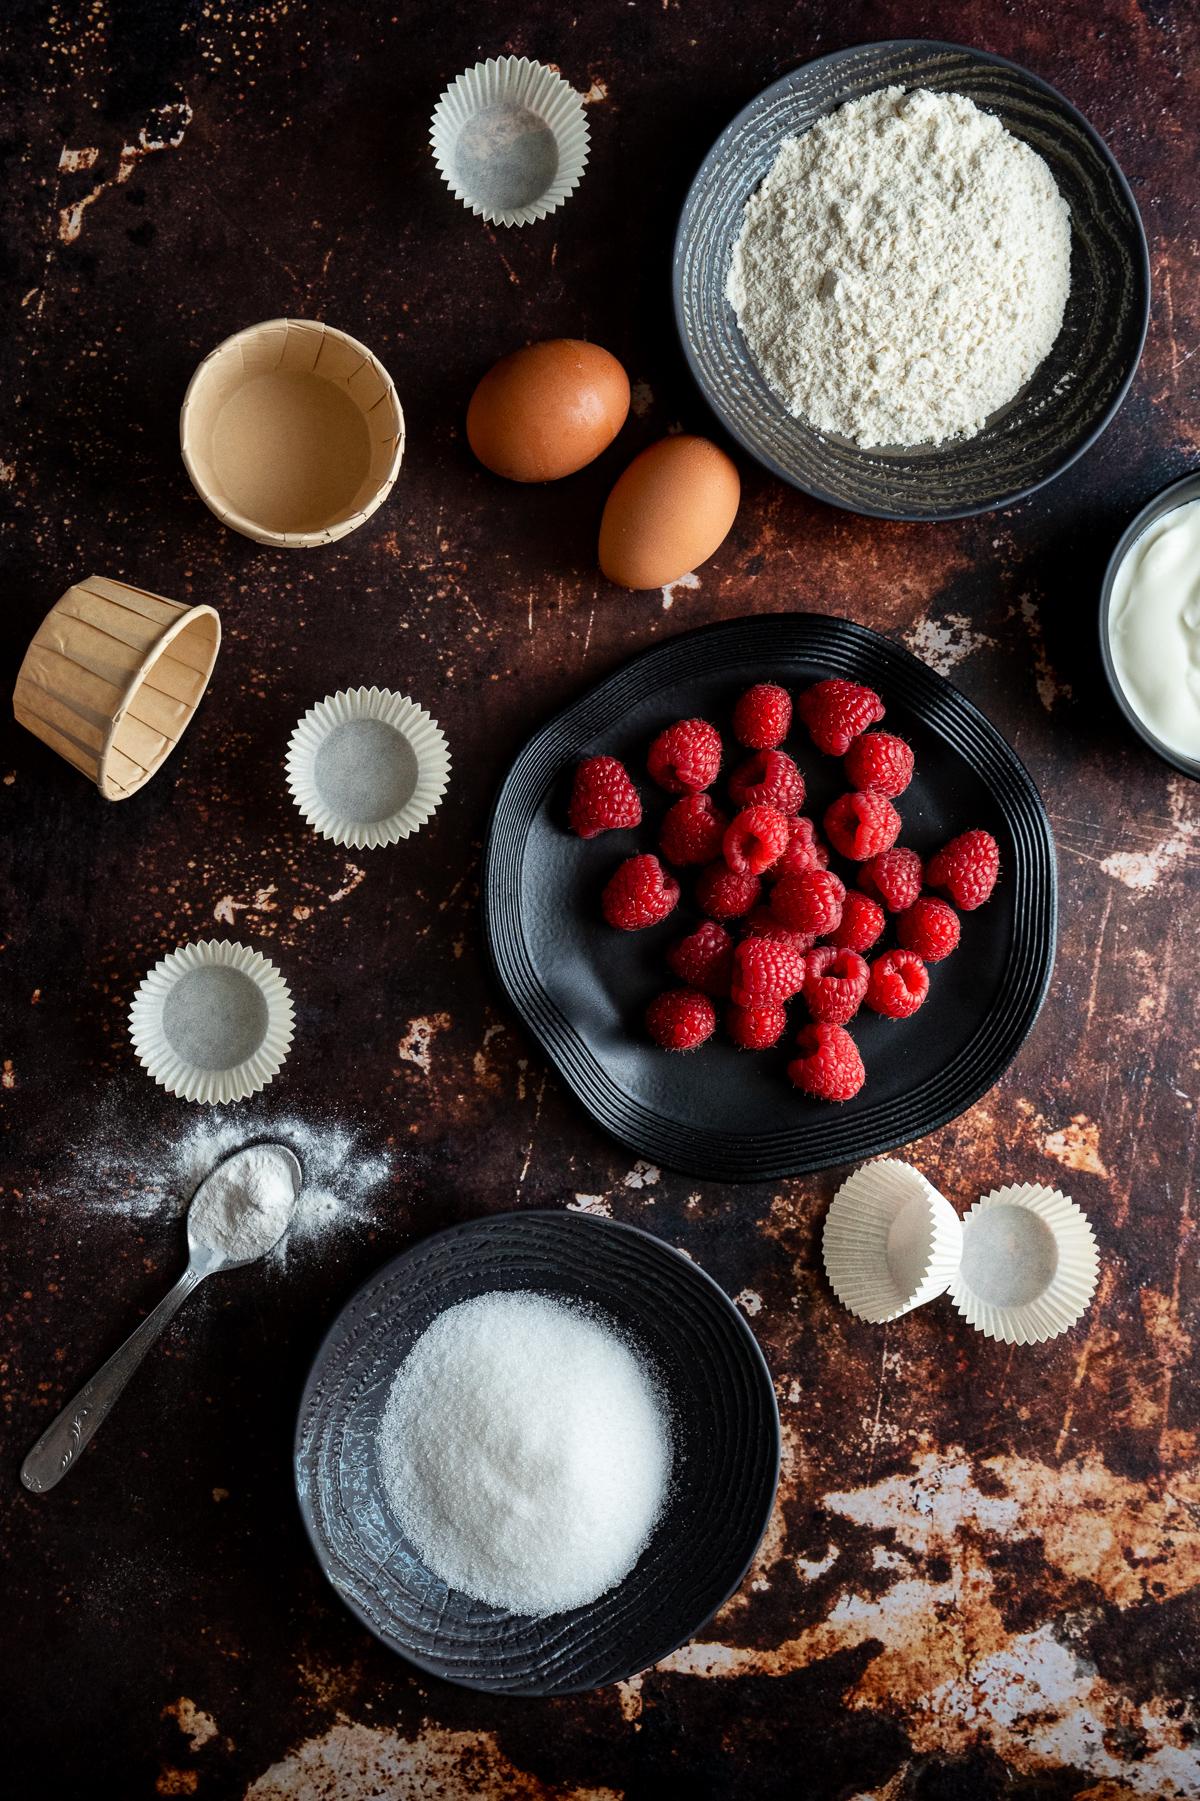 ingrédients recette cuisine dessert framboise yaourt grec